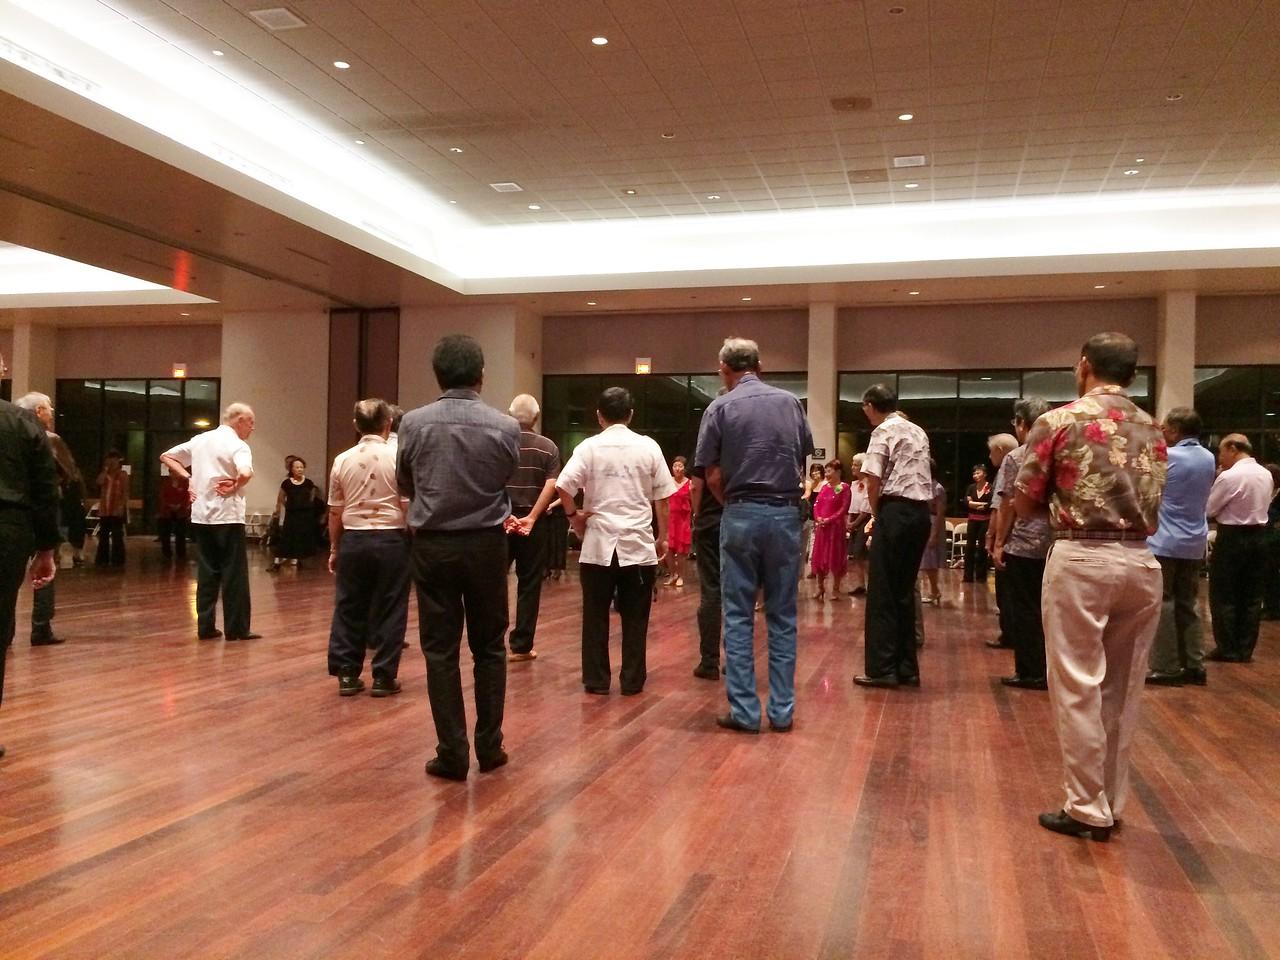 050517 IBDI dance, workshop by Al Franz